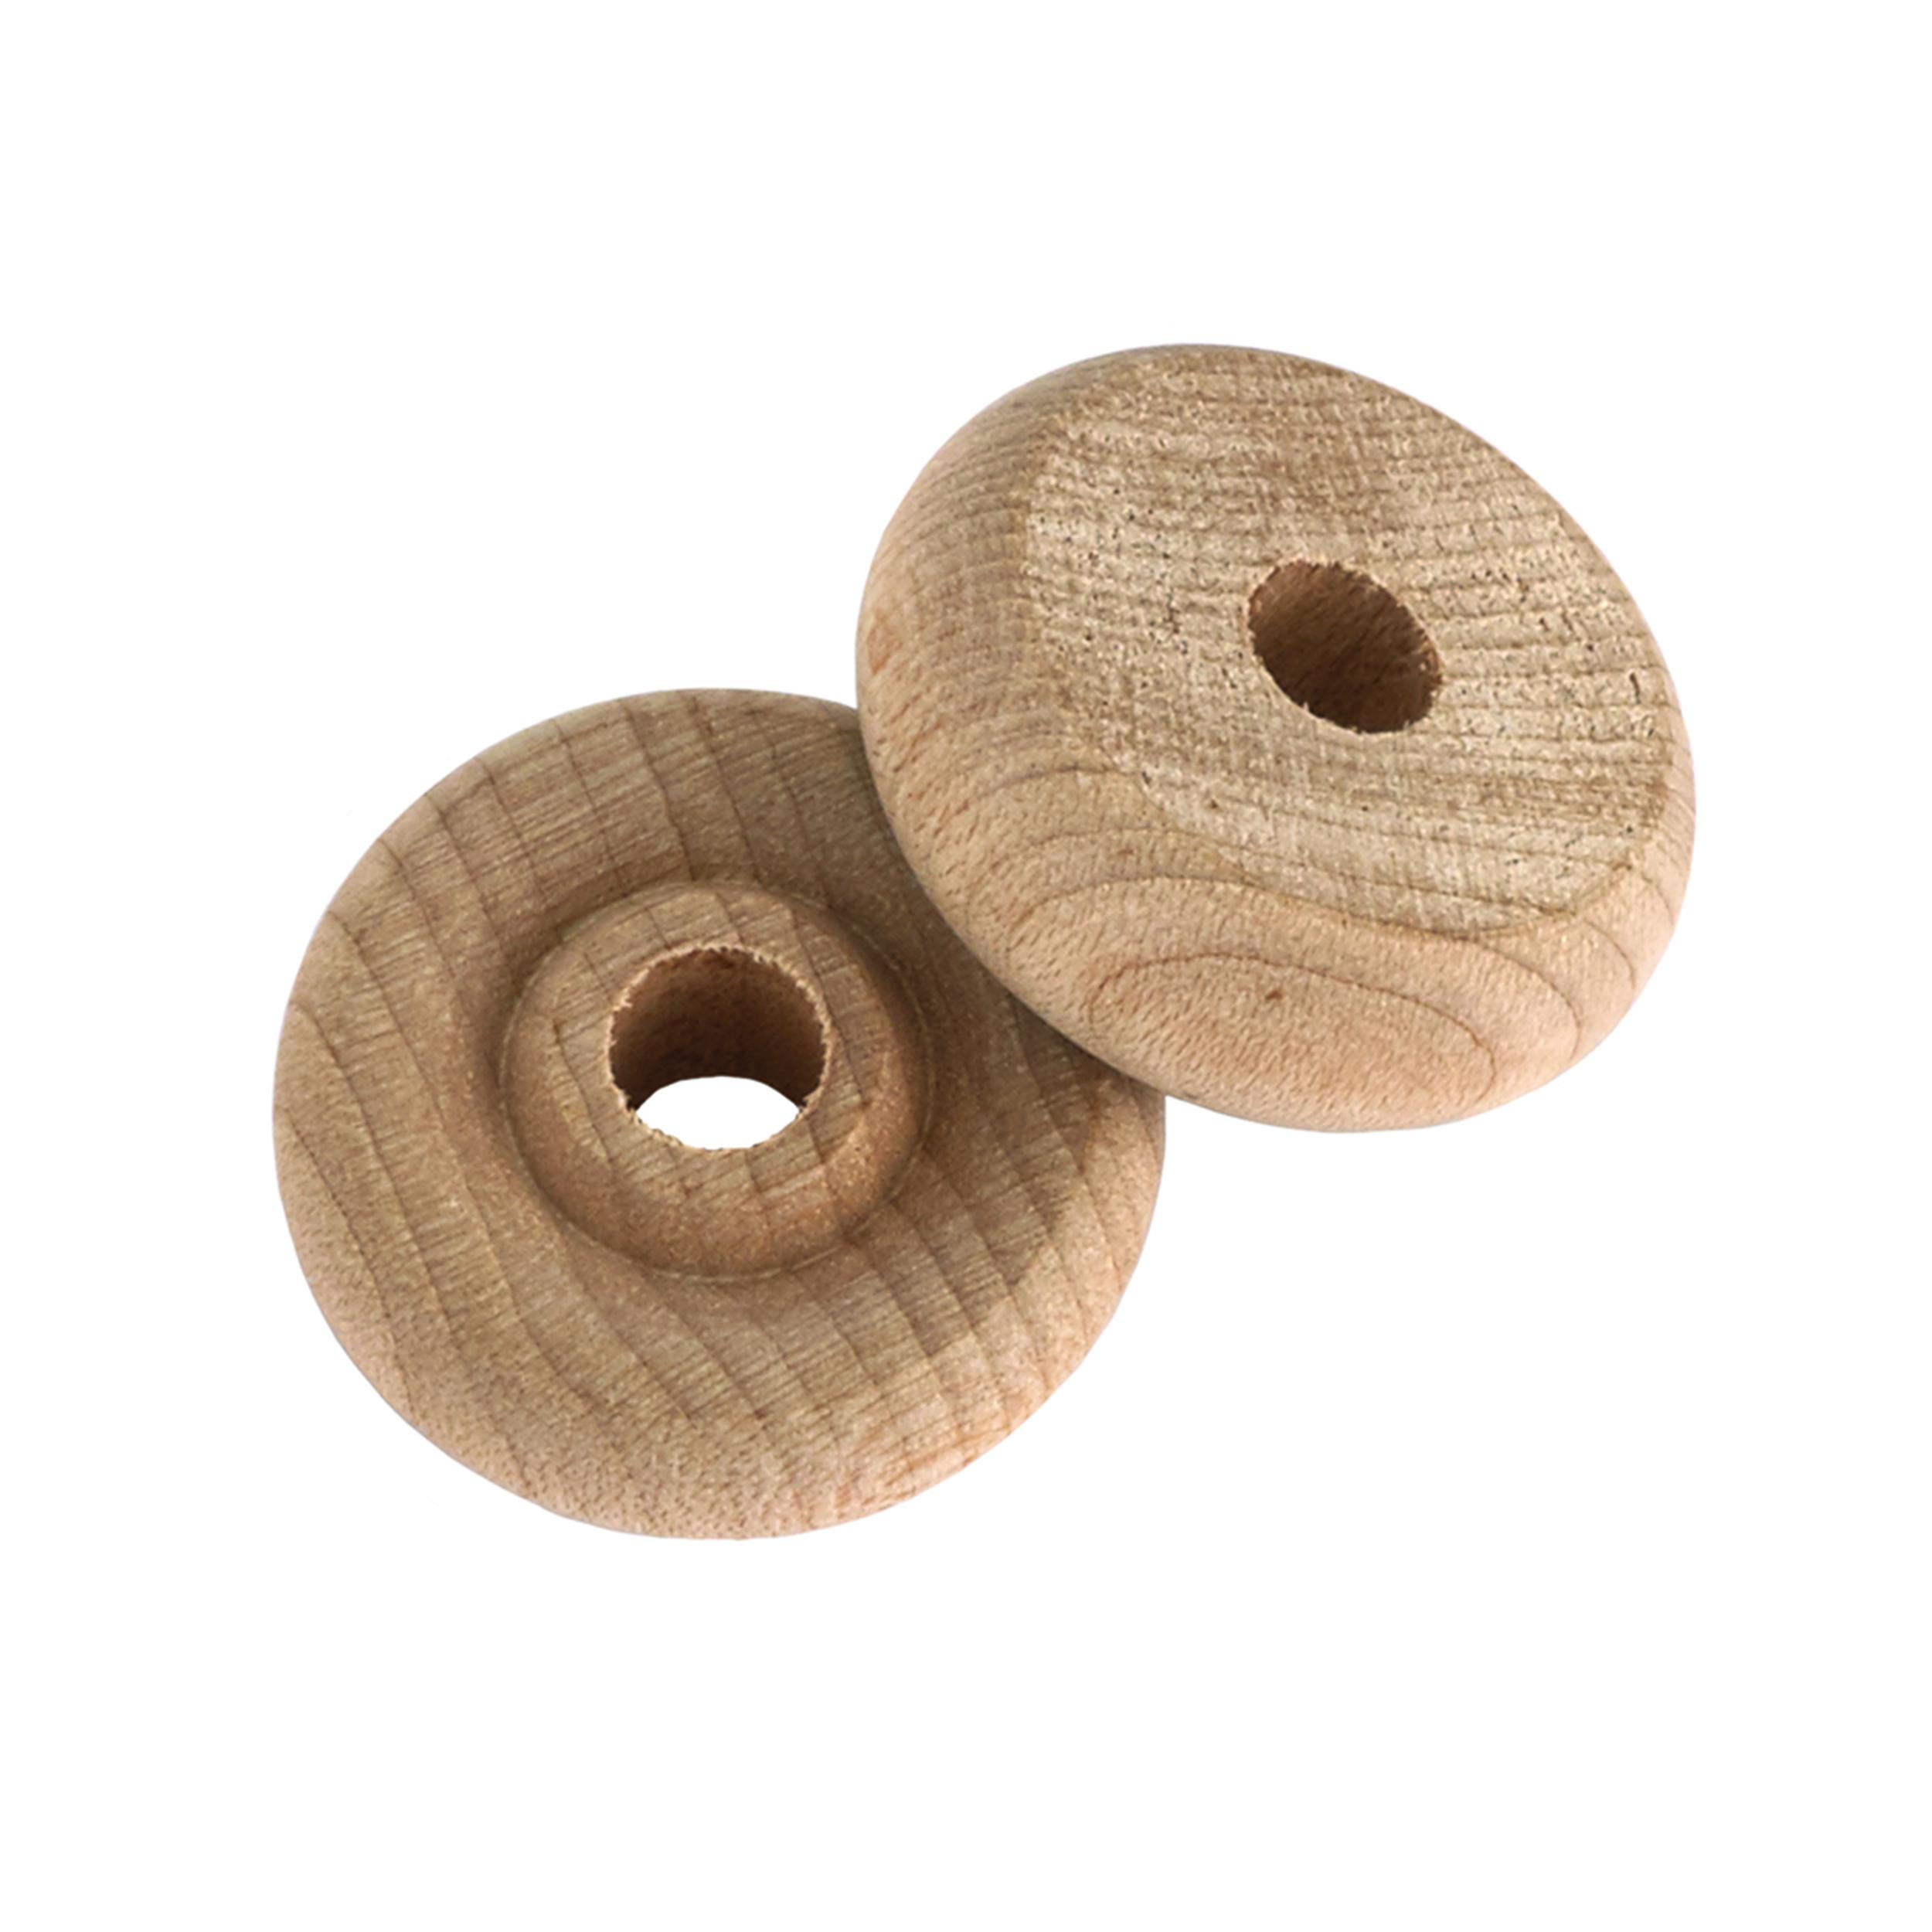 Wooden Toy Wheels, 1